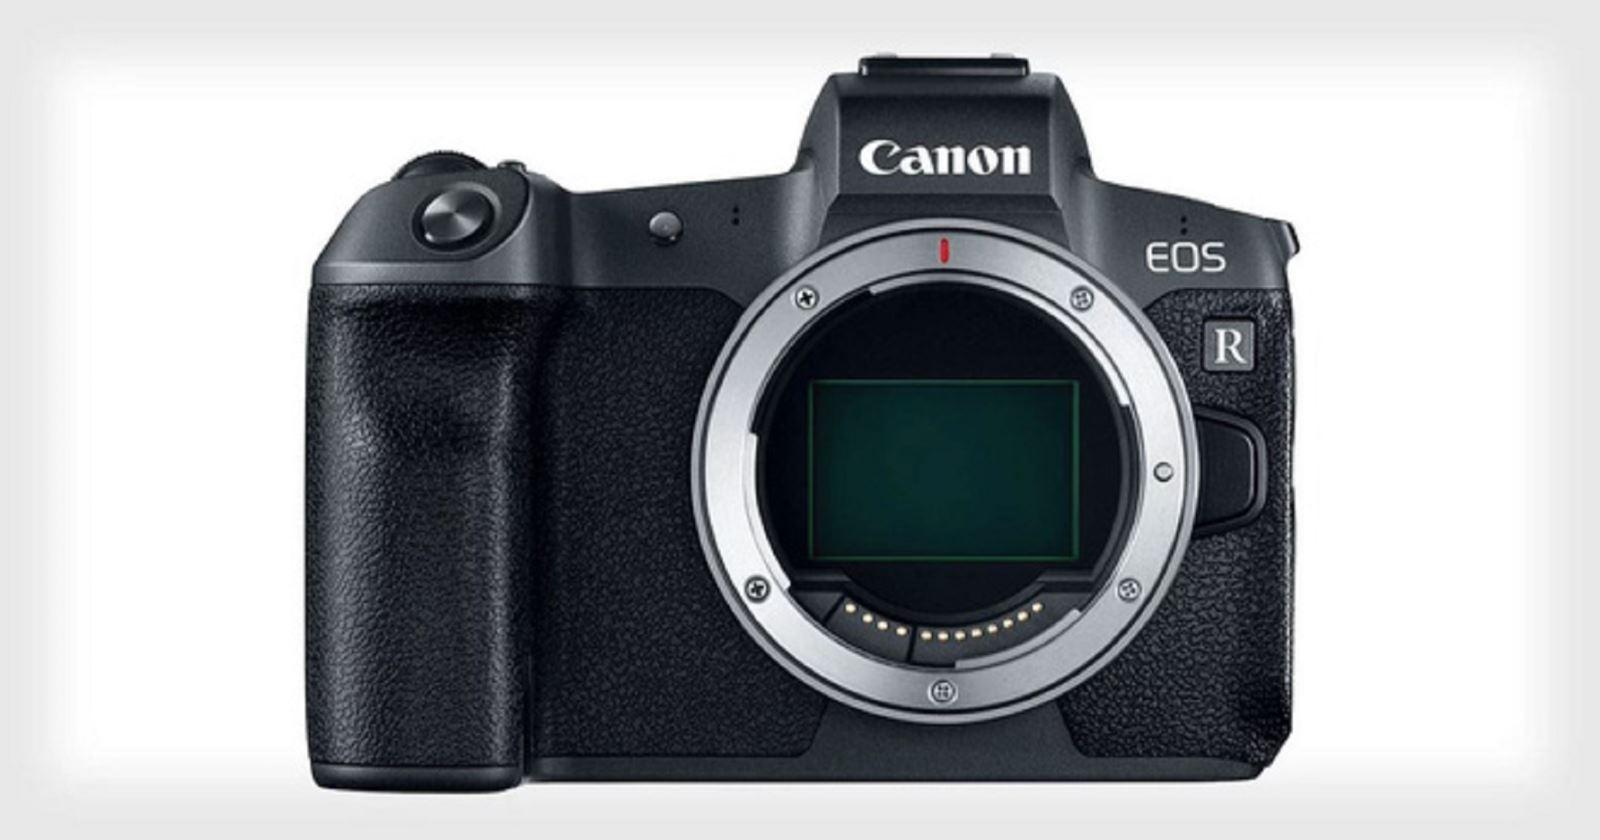 Canon cập nhậpfirmware V1.1.0choEOS R